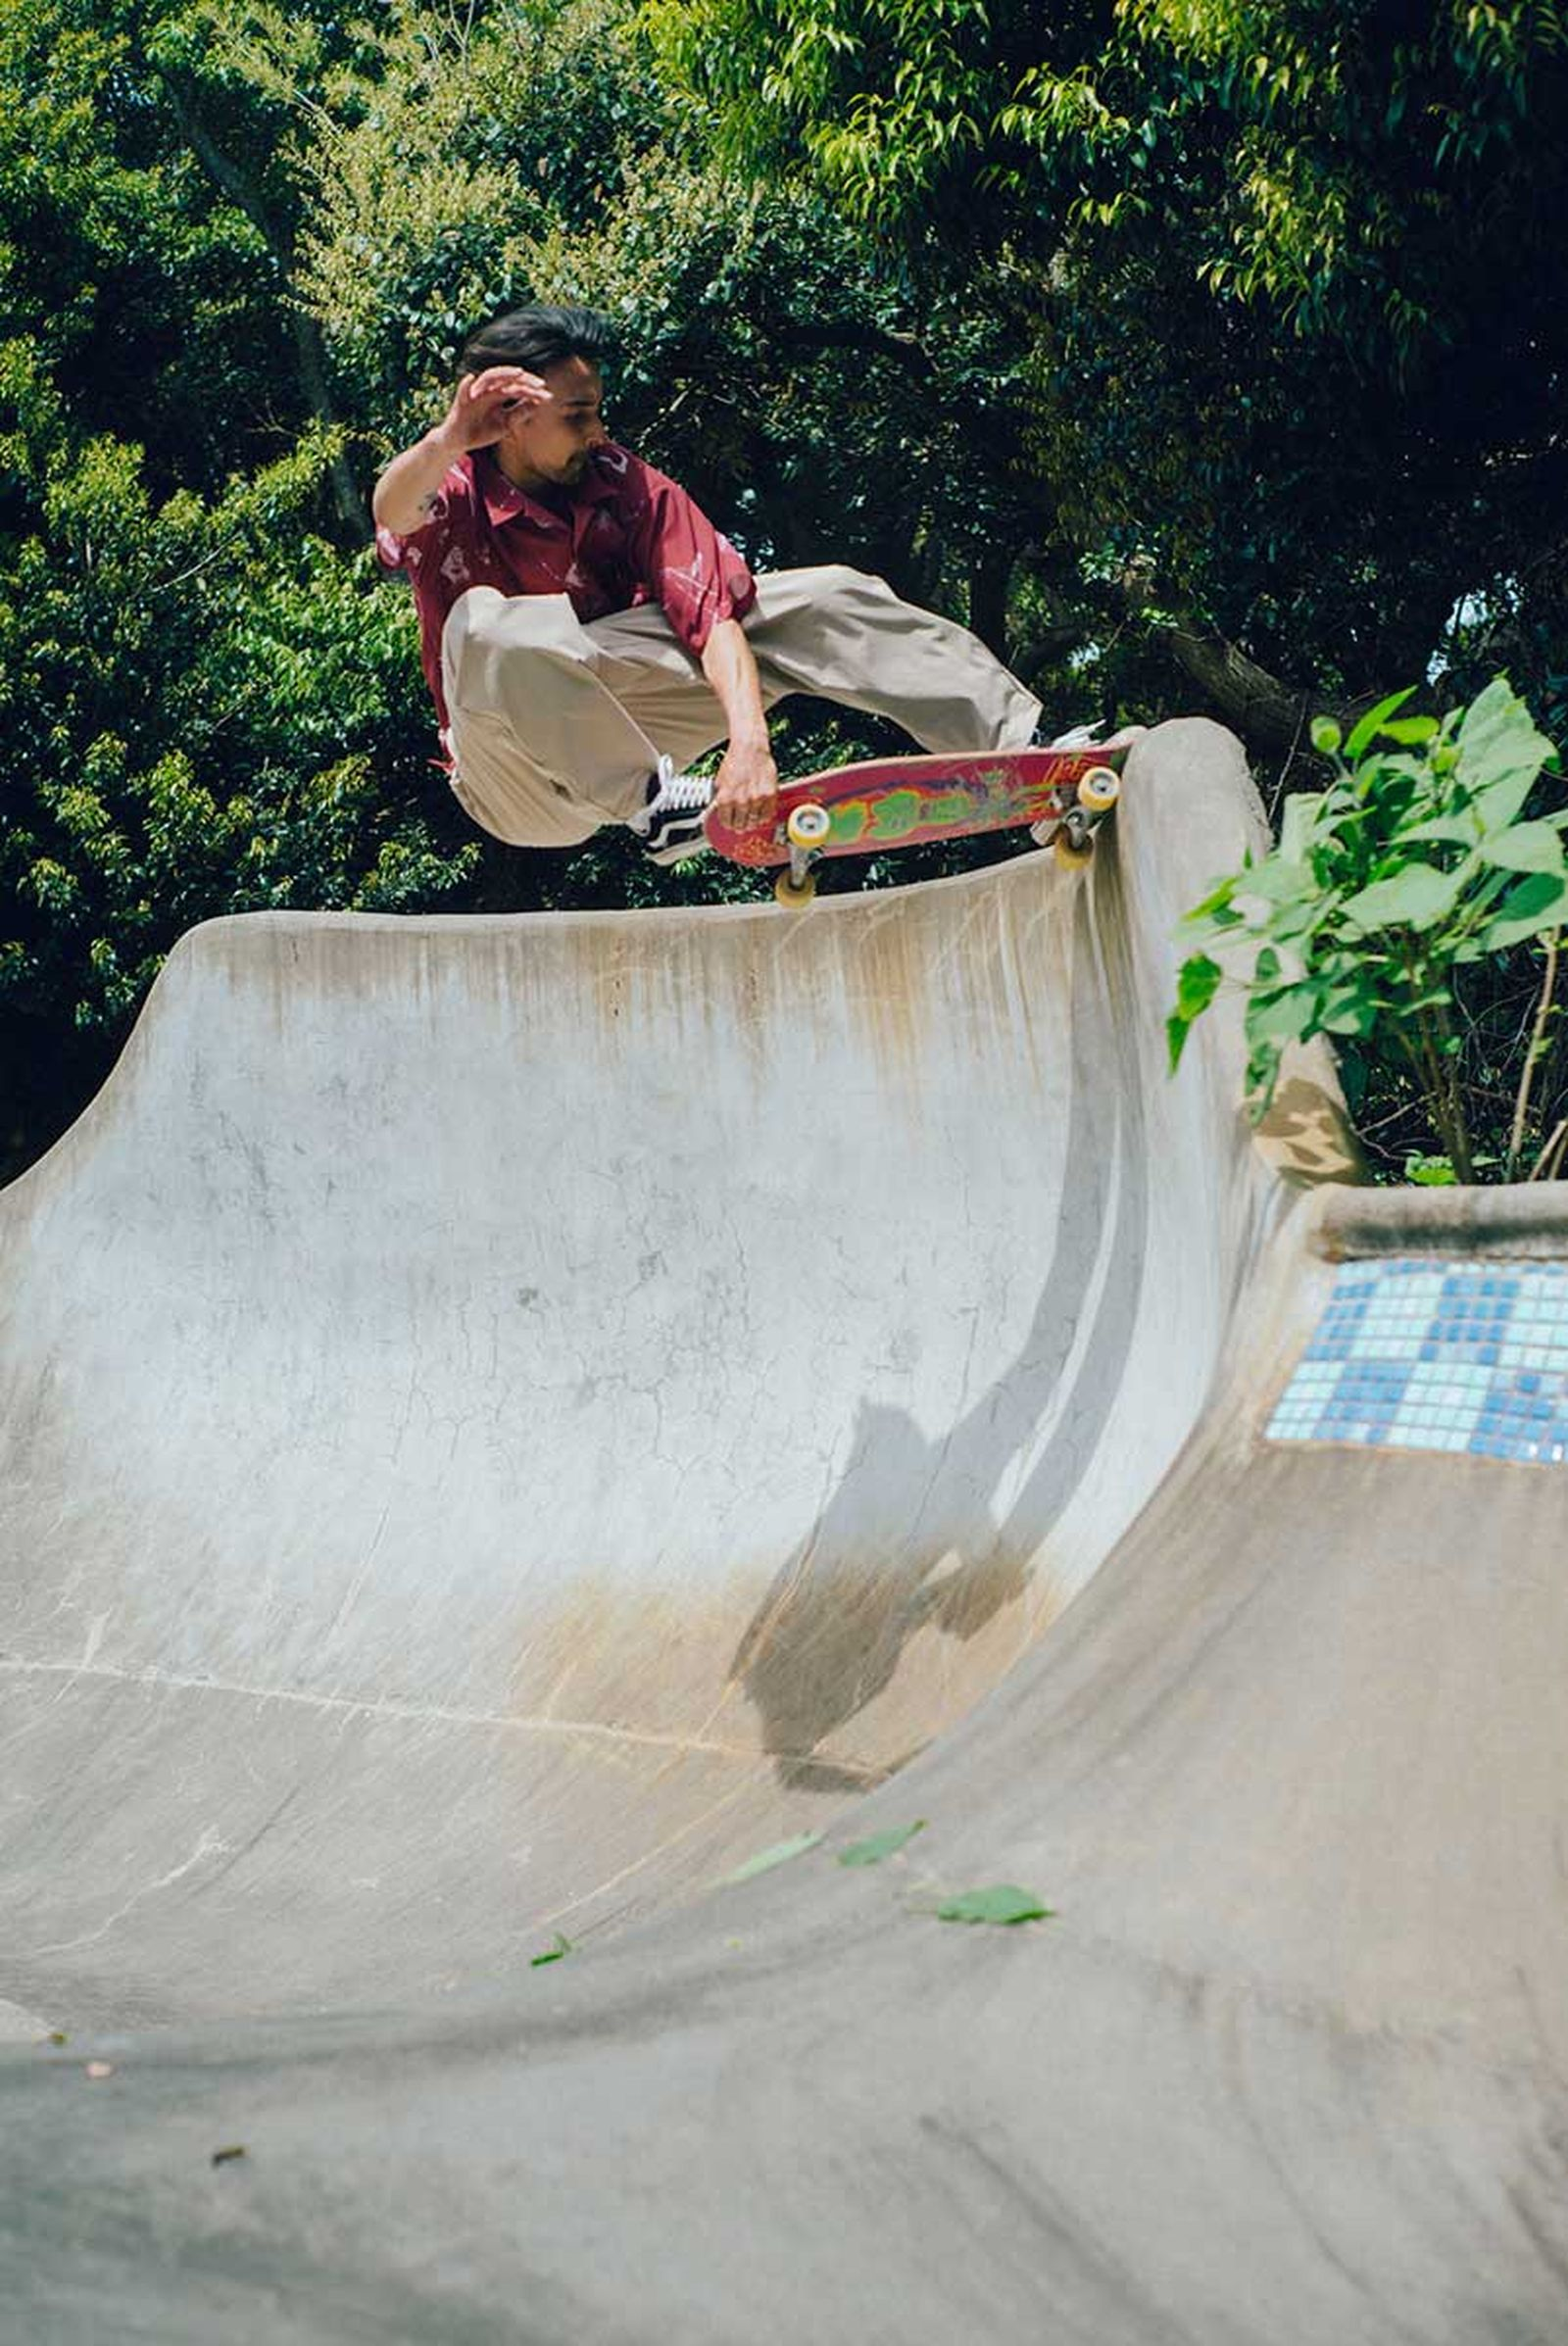 evisen-skateboards-summer-2021-(13)